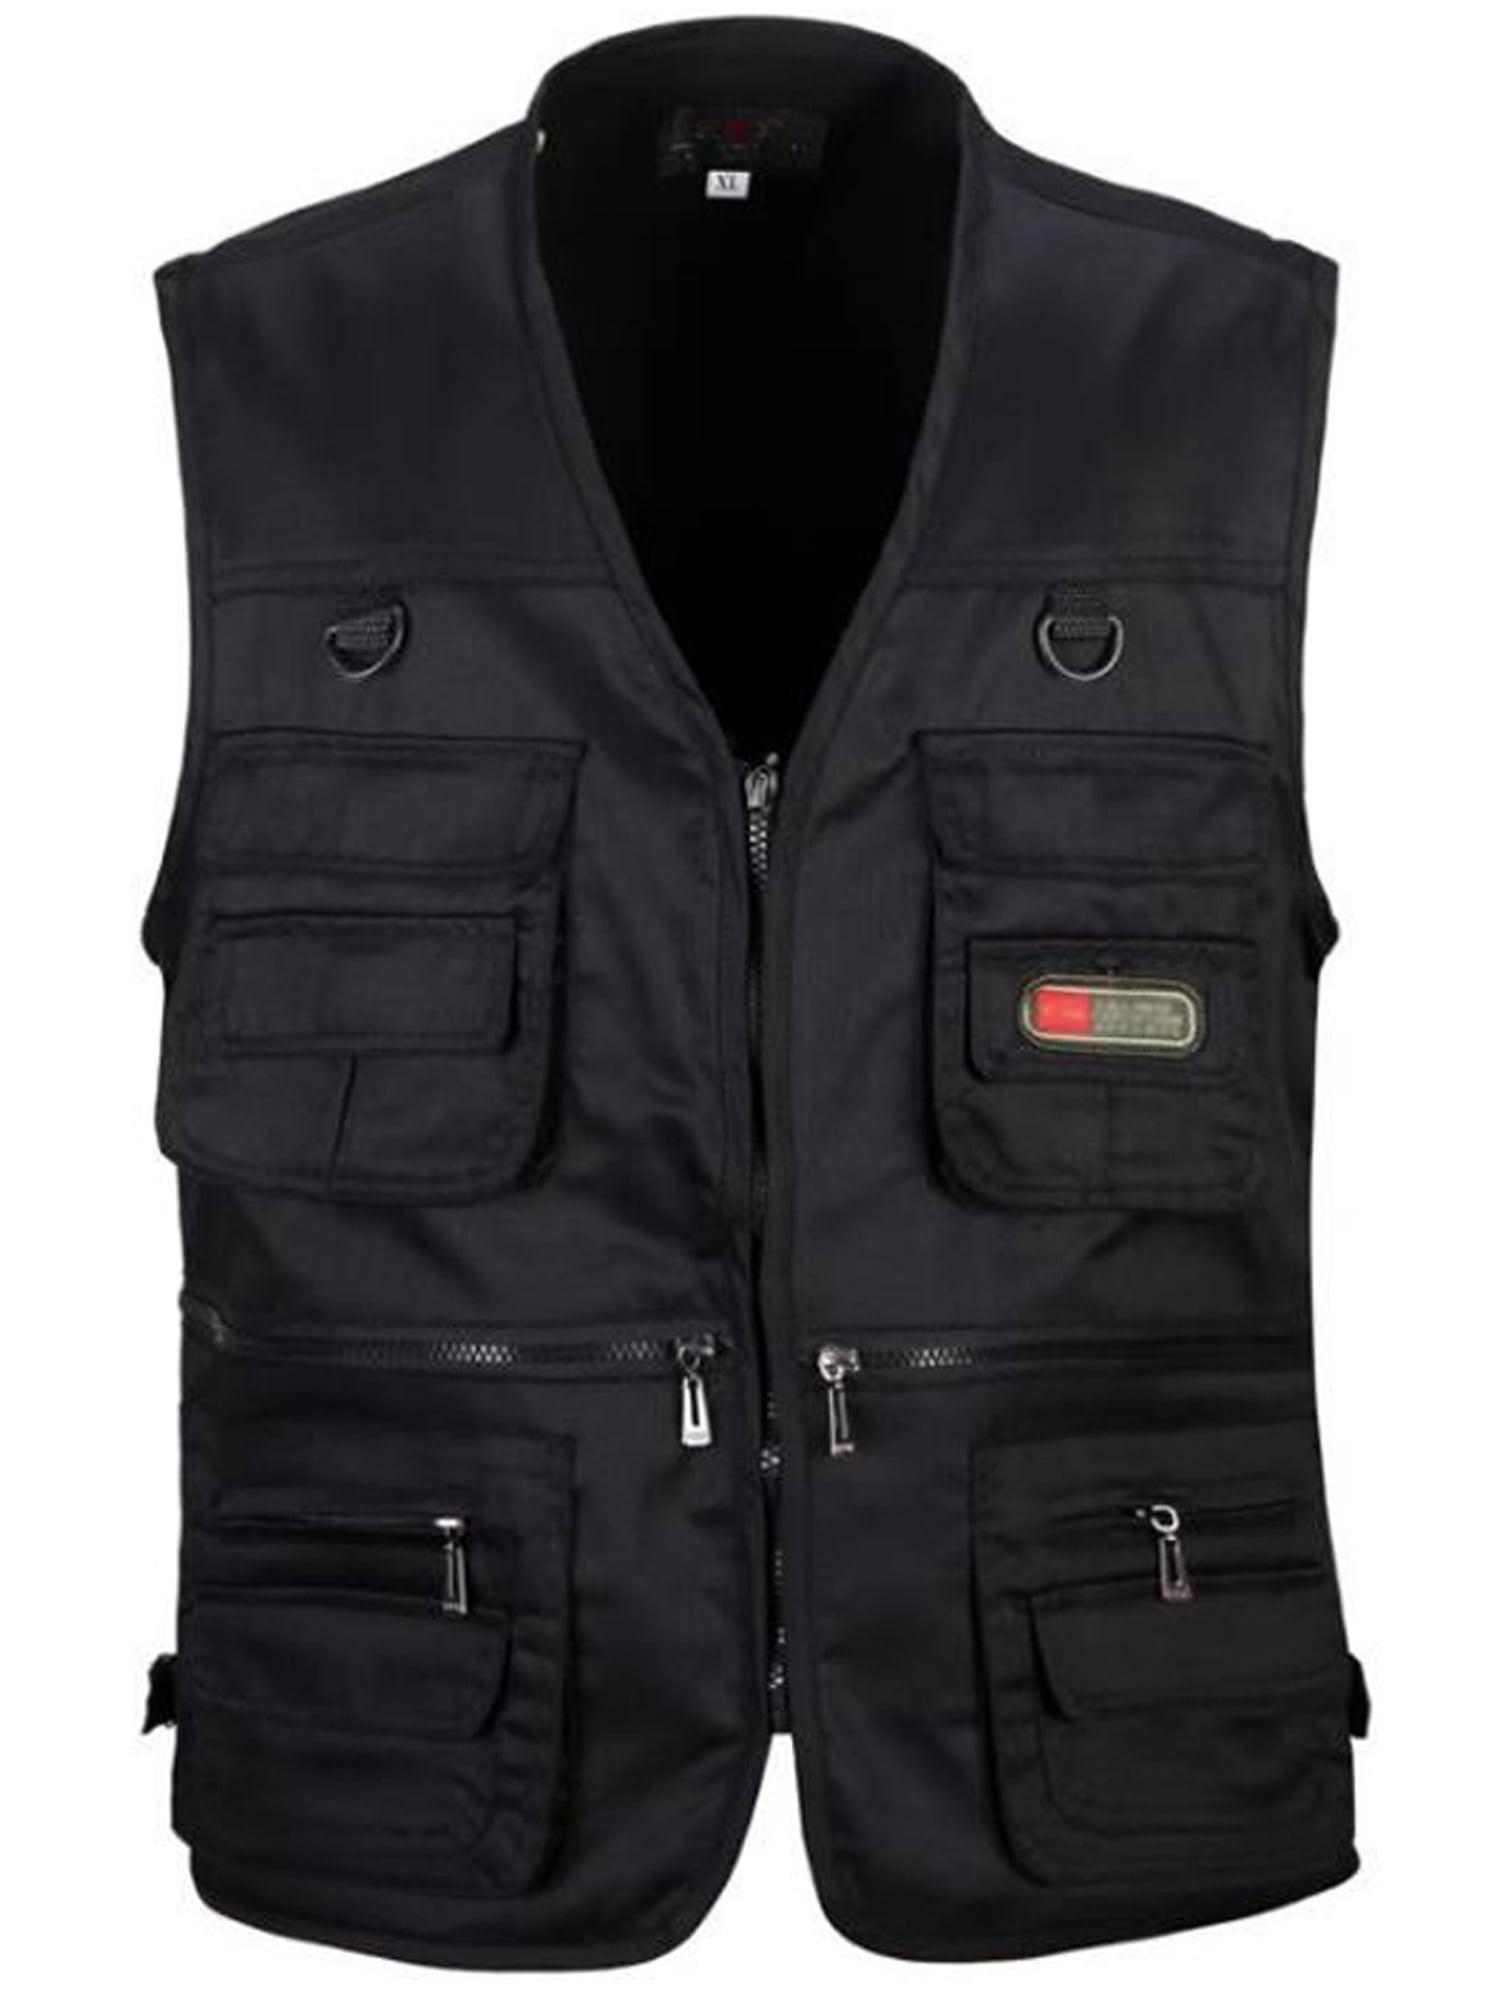 Men/'s Multi-Pocket Fishing Vest Photography Camping Jacket Zipper Waistcoat US